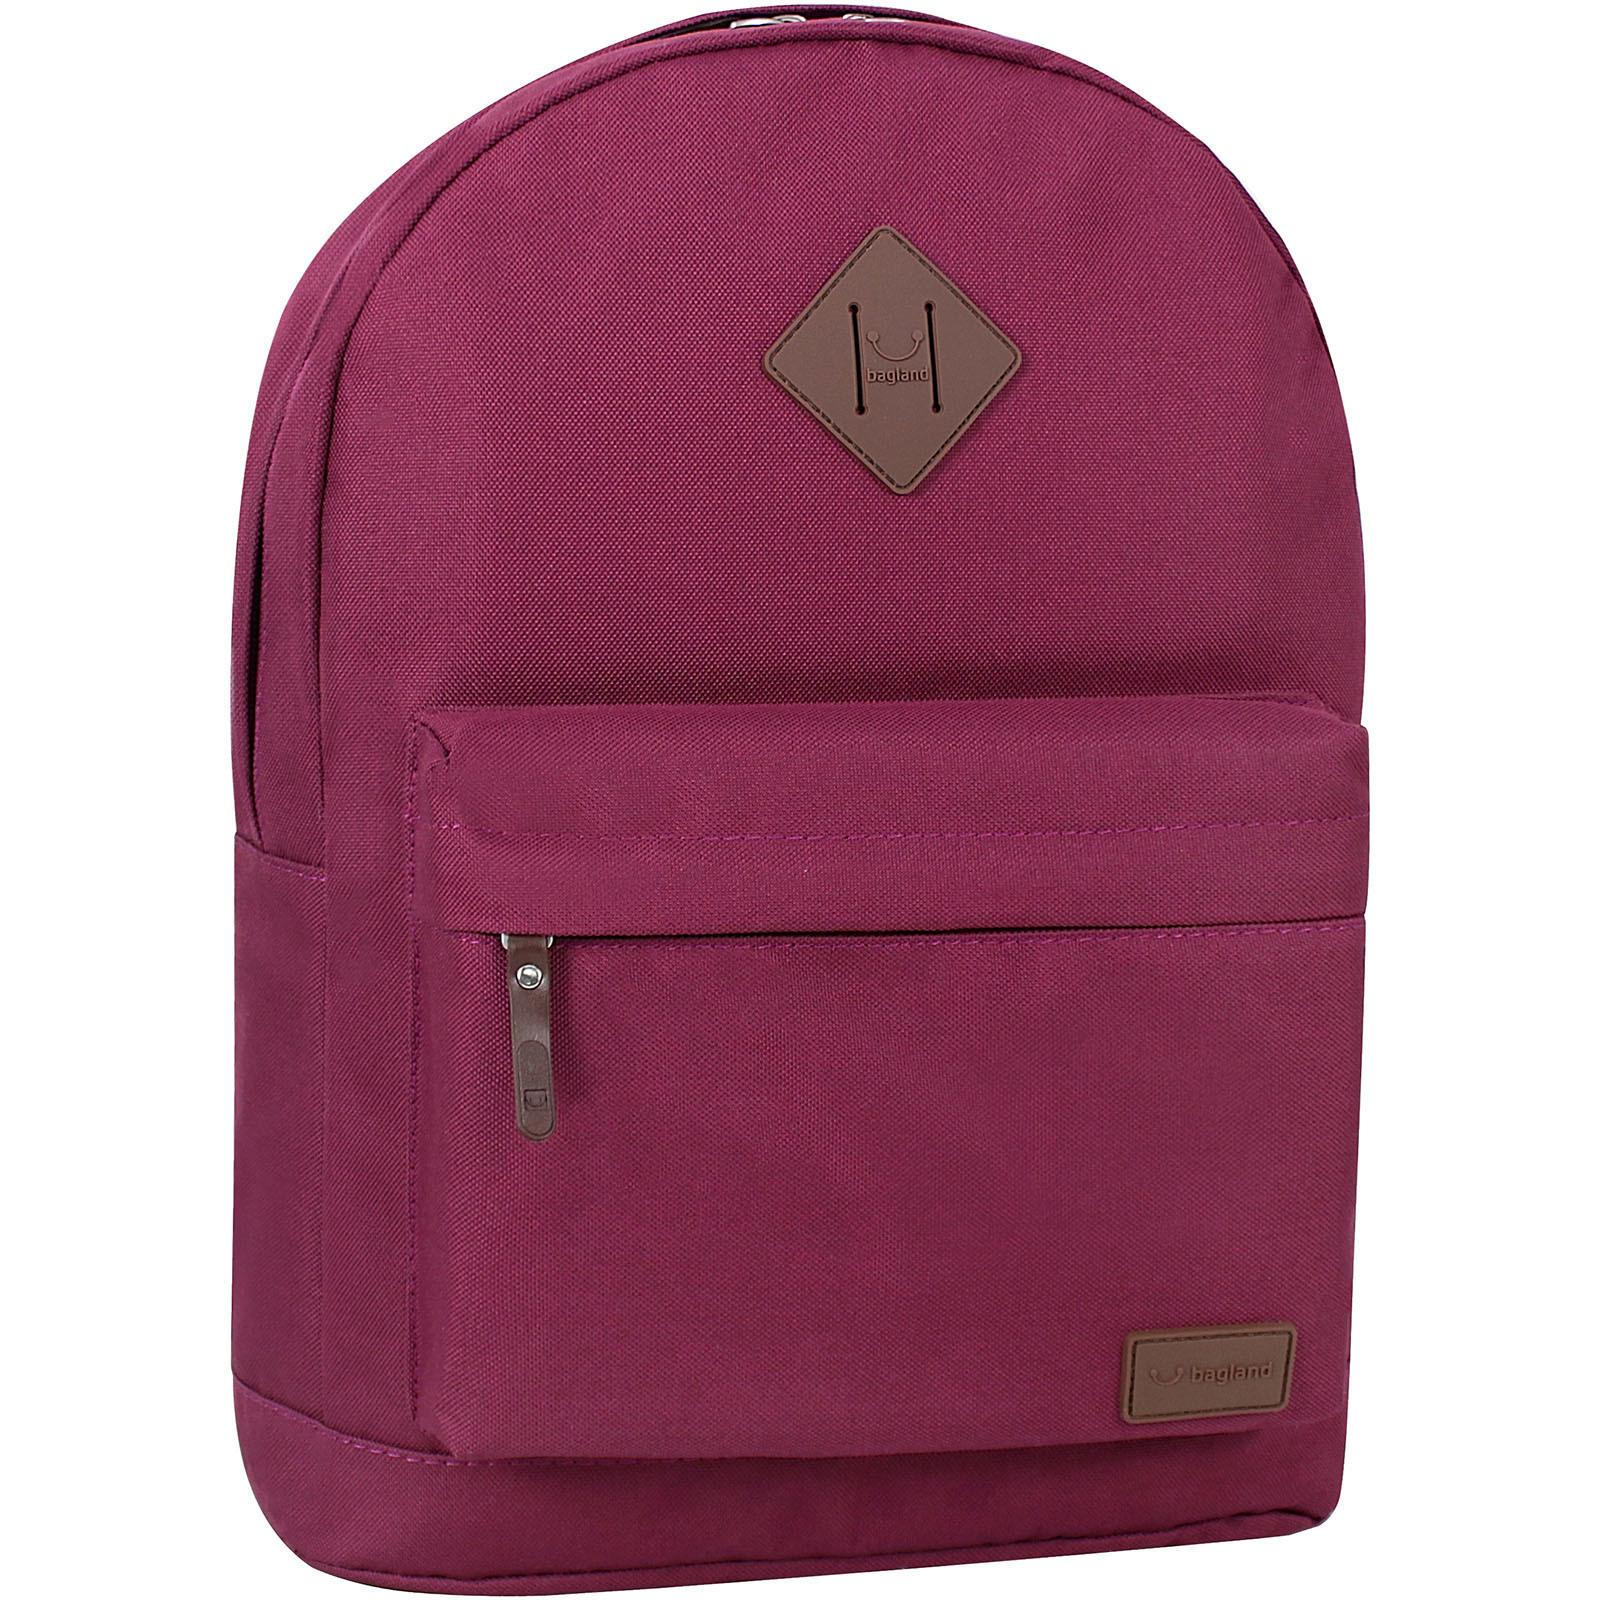 Молодежные рюкзаки Рюкзак Bagland Молодежный W/R 17 л. Вишня (00533662) IMG_8396.JPG